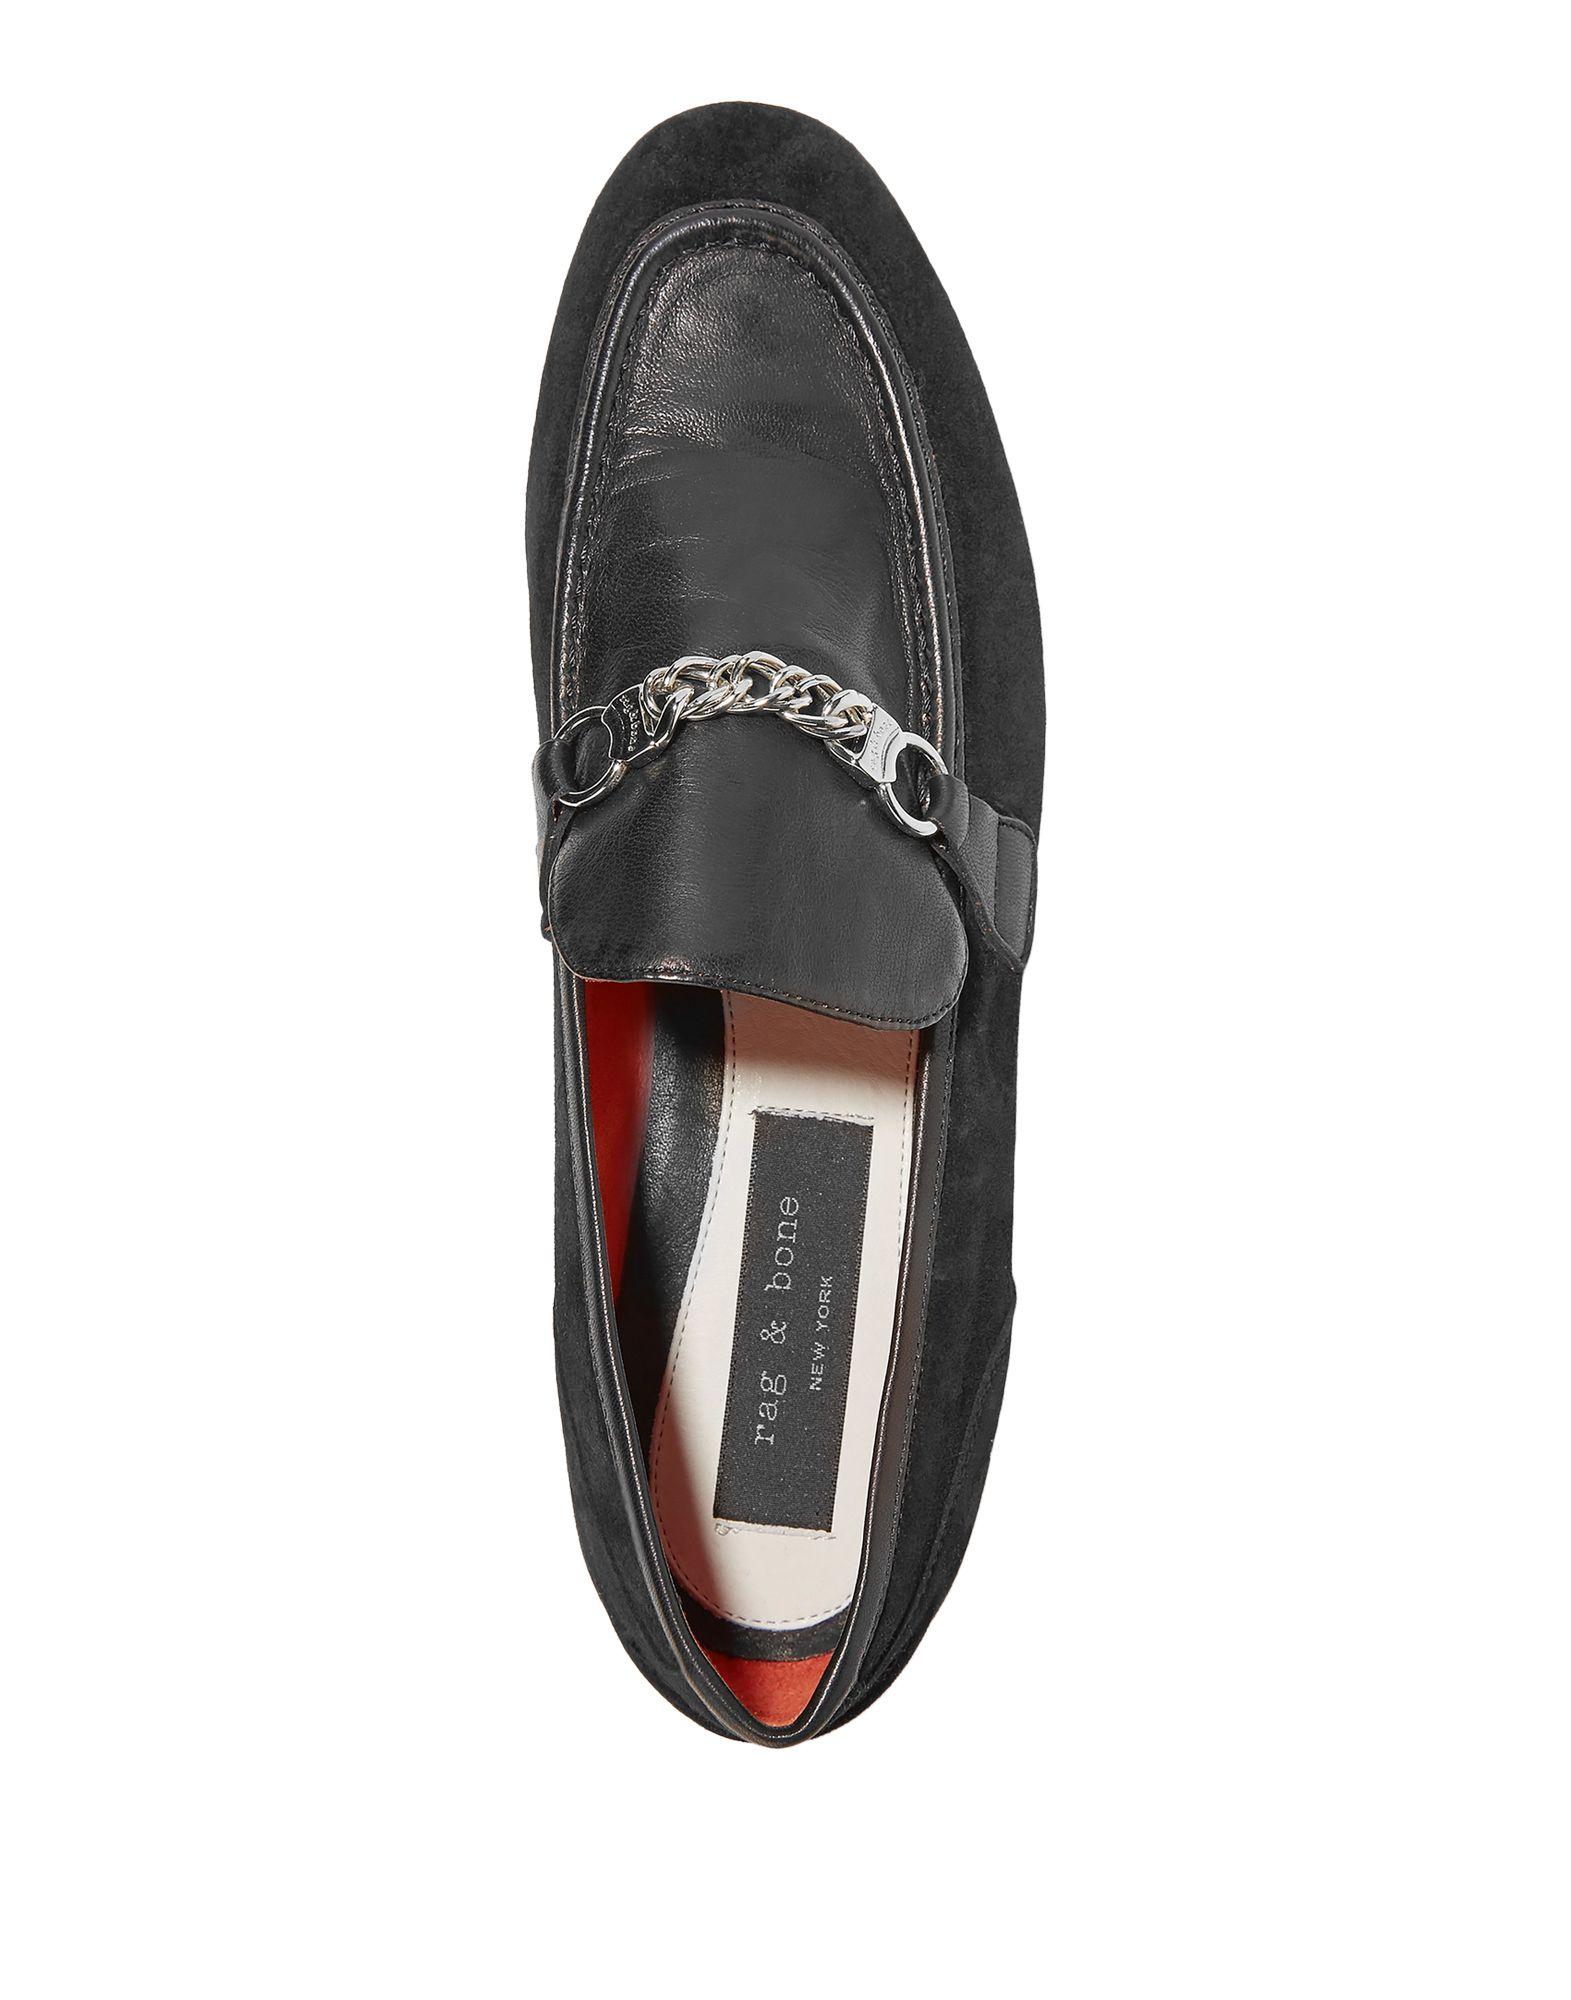 Rabatt Schuhe Mokassins Rag & Bone Mokassins Schuhe Damen  11561823RW 5041d5